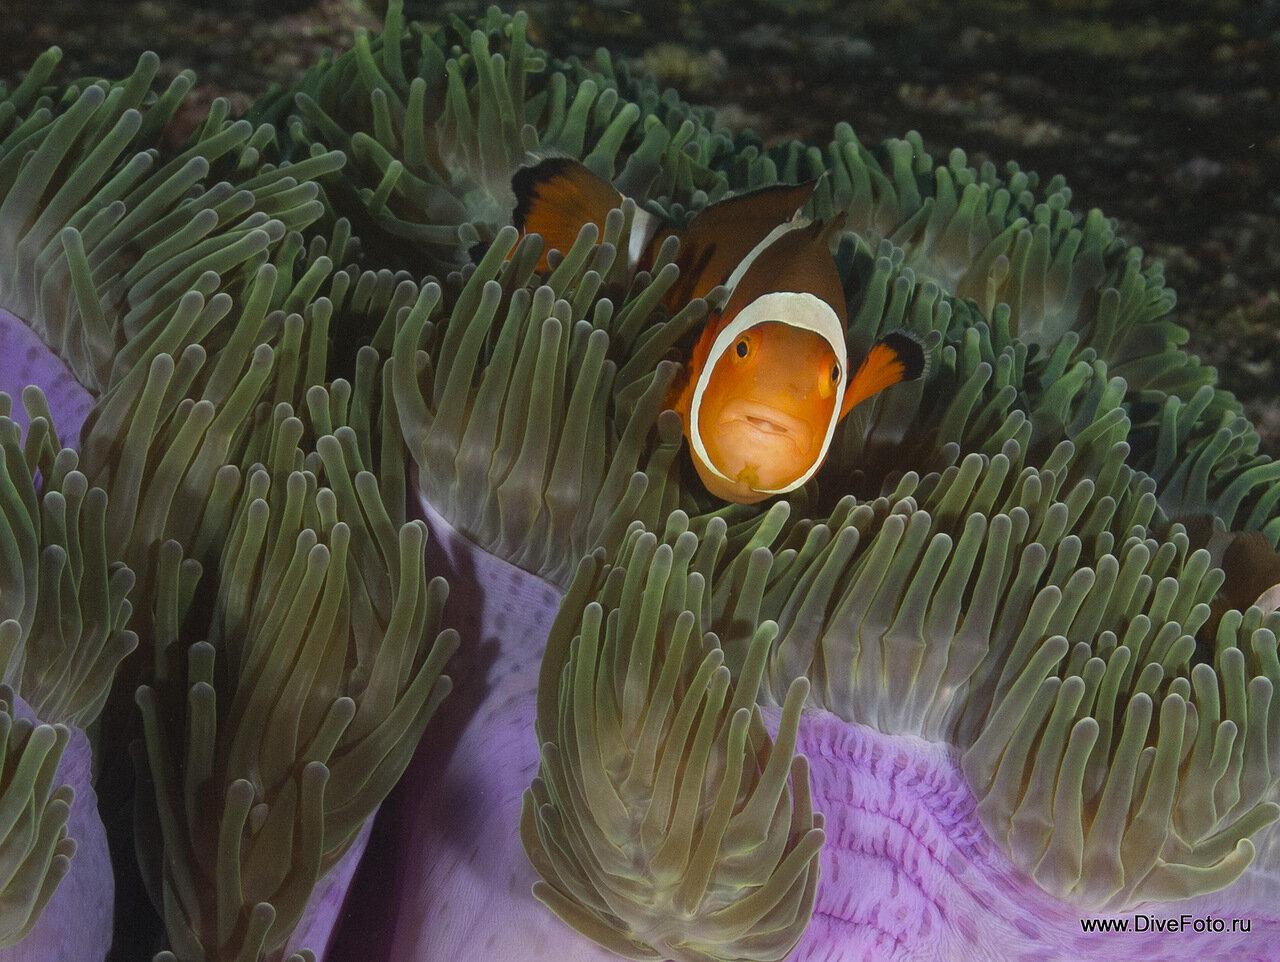 Оранжевая рыба клоун Amphiprion percula  в фиолетовом анемоне фото